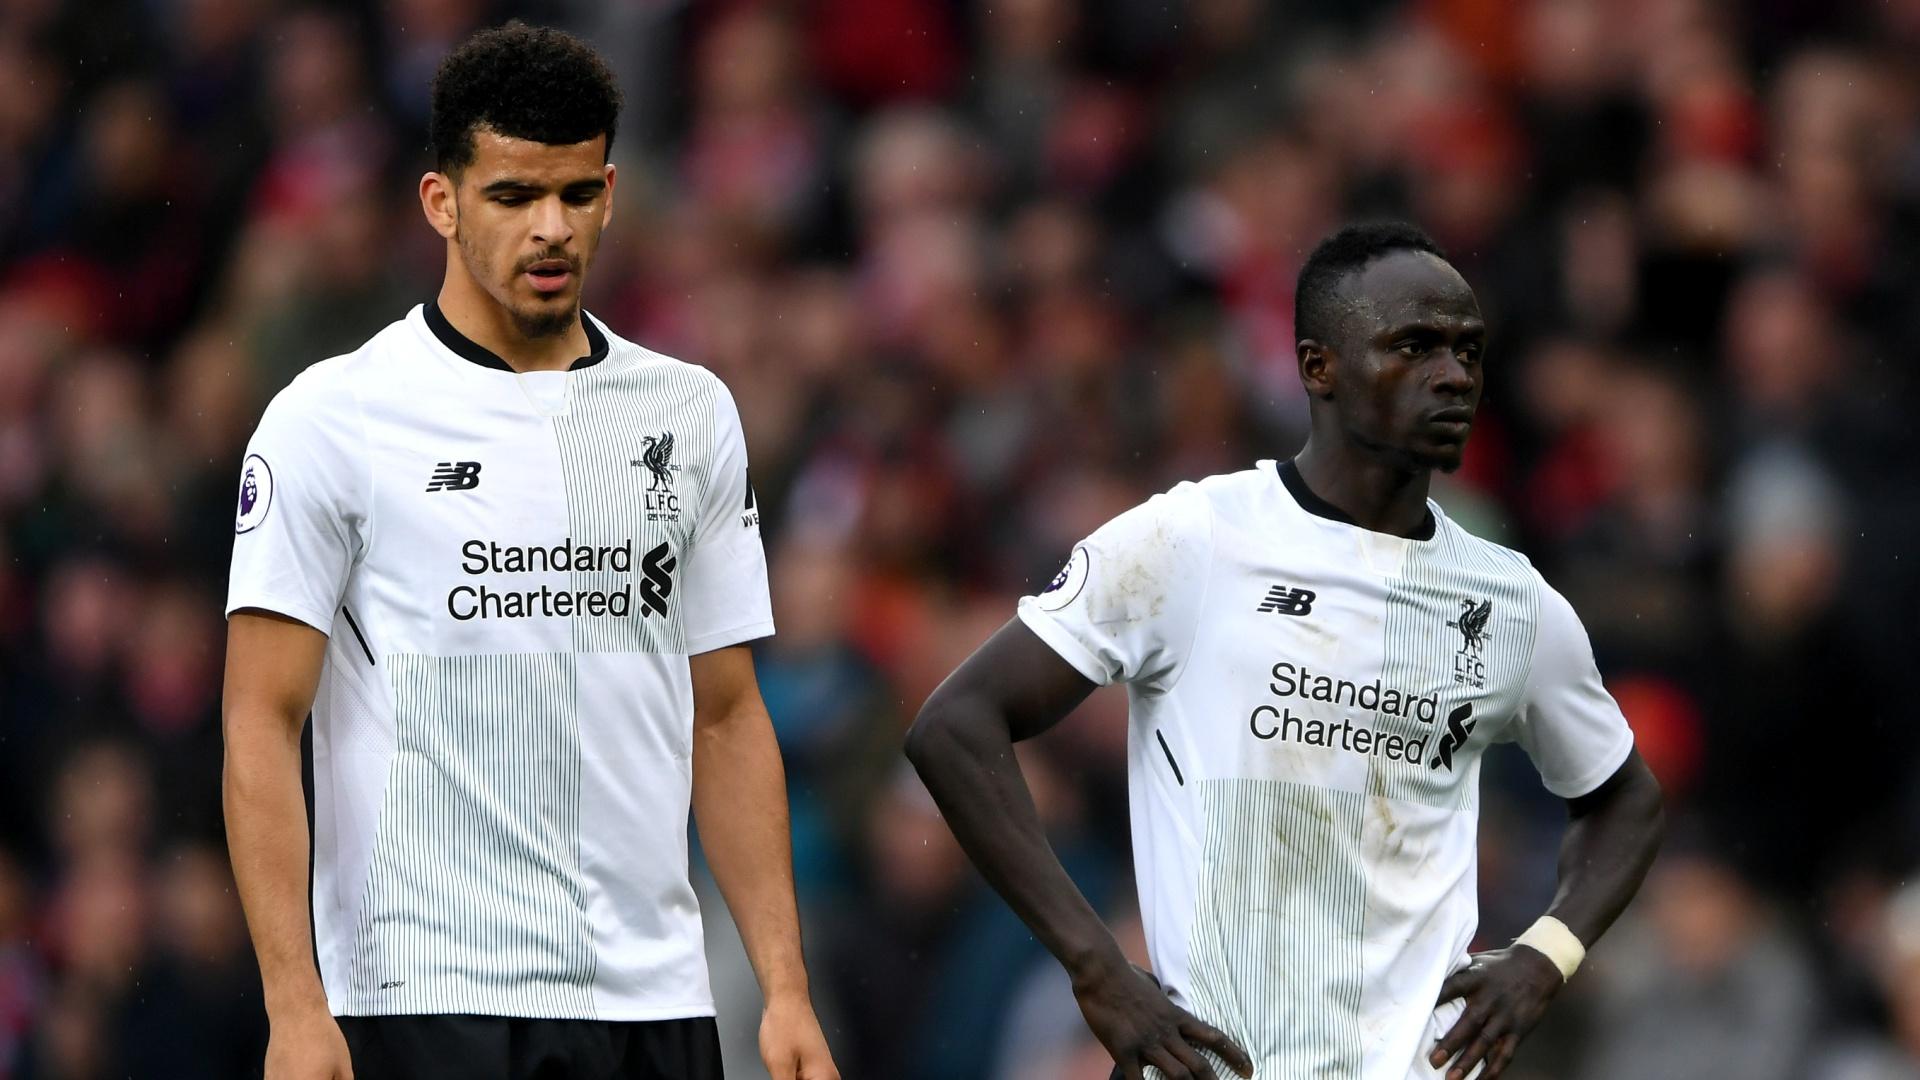 Dominic Solanke Sadio Mane Liverpool 2018-03-10